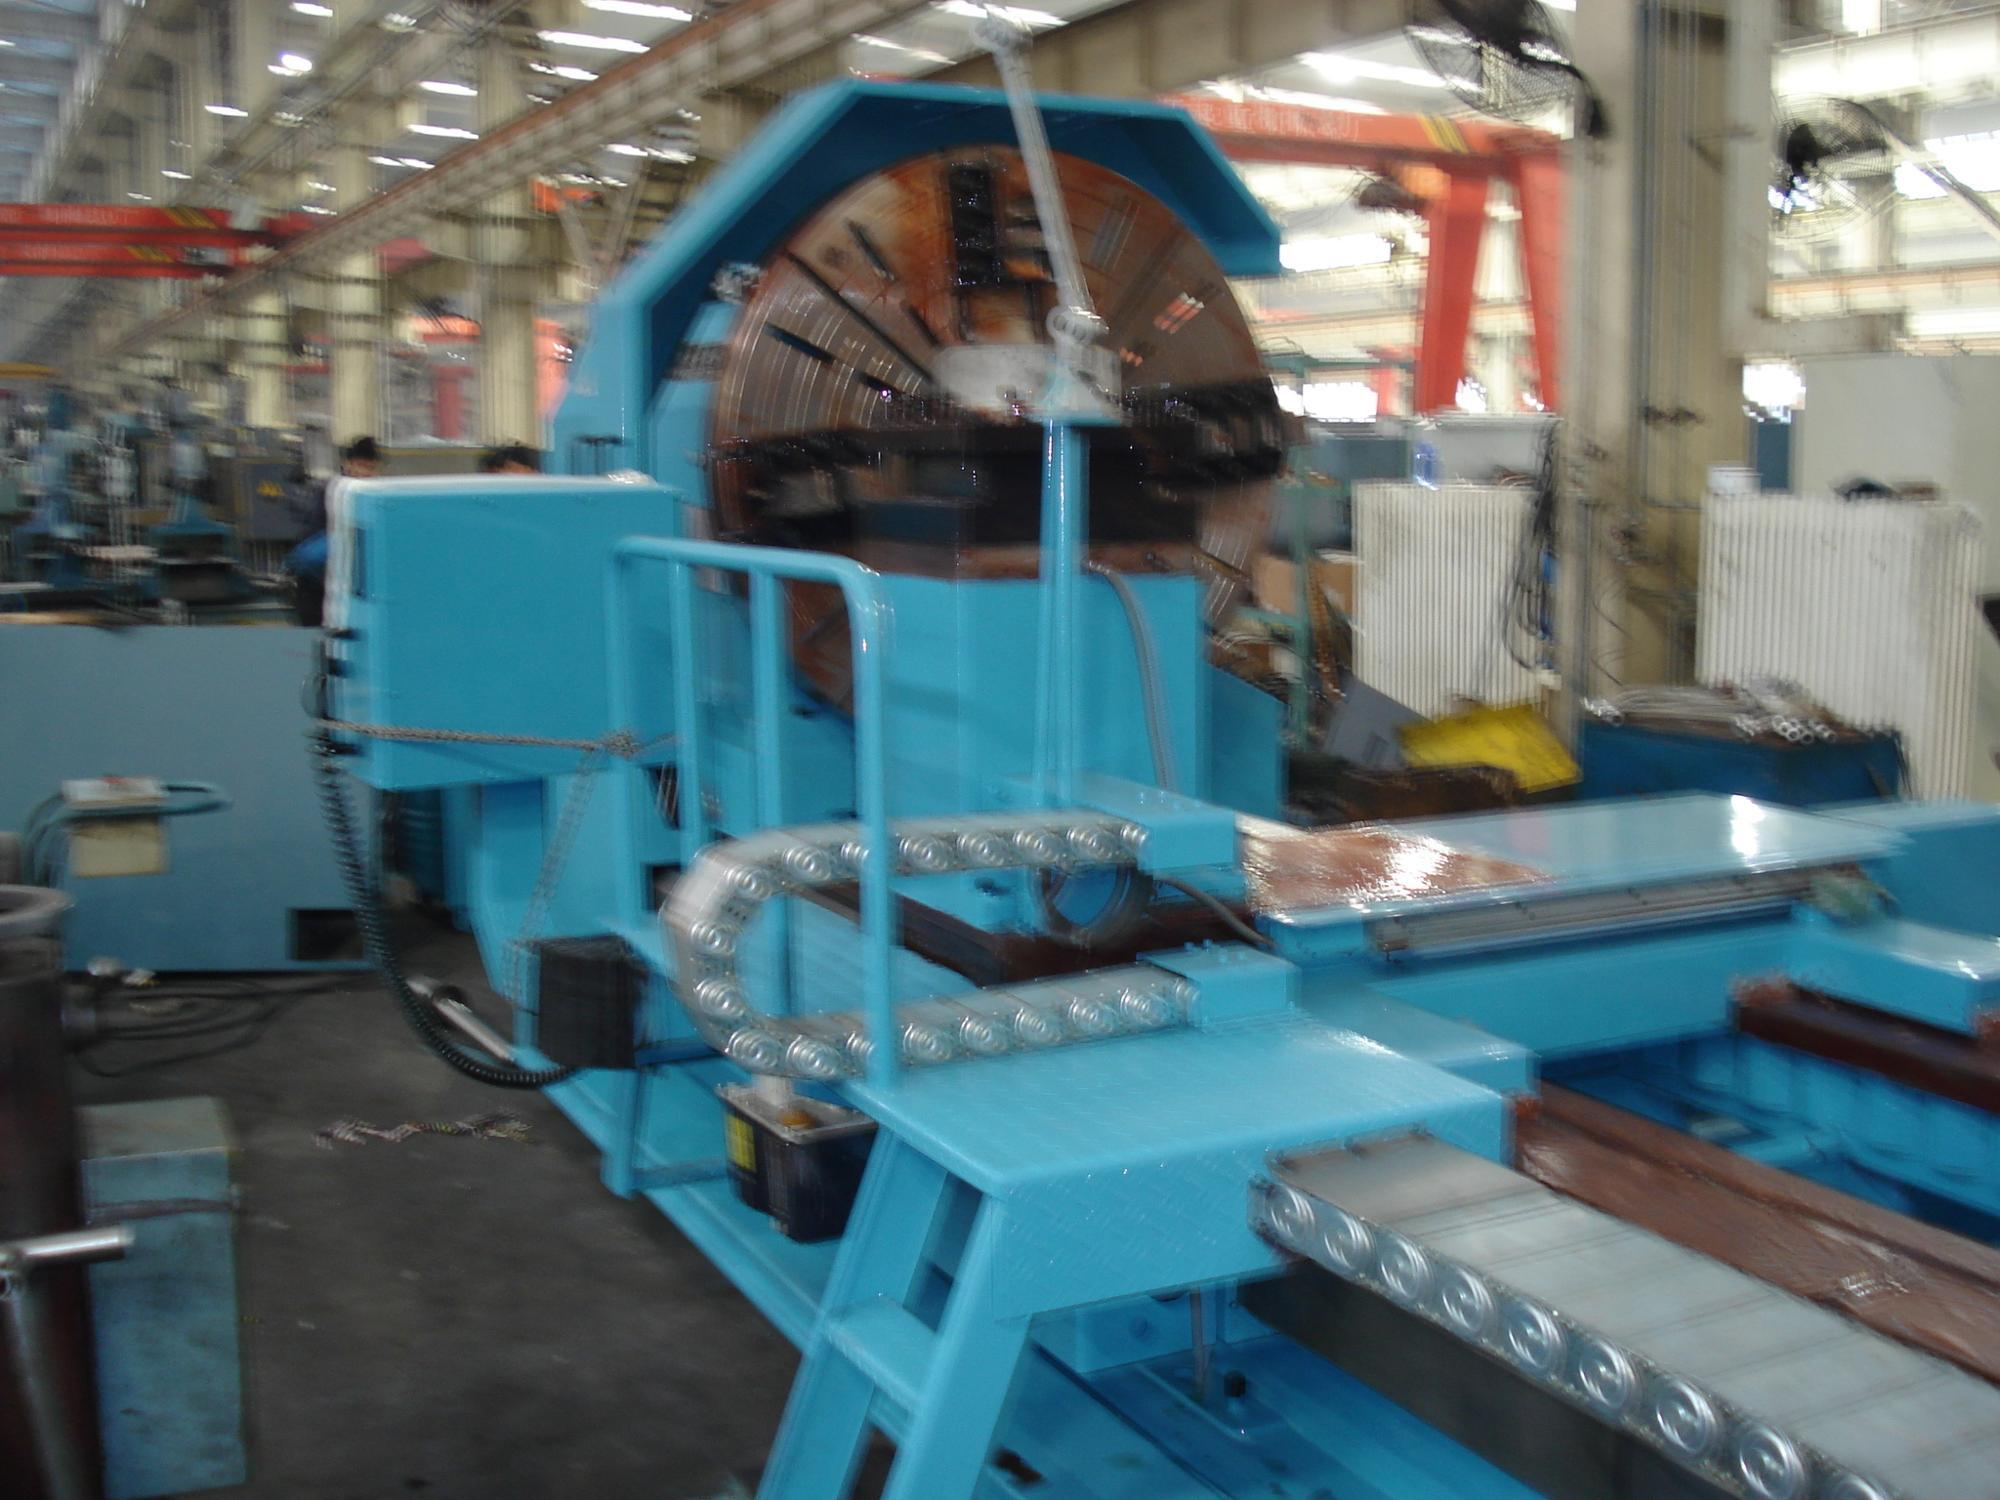 Heavy duty cnc lathe machine for metal cutting